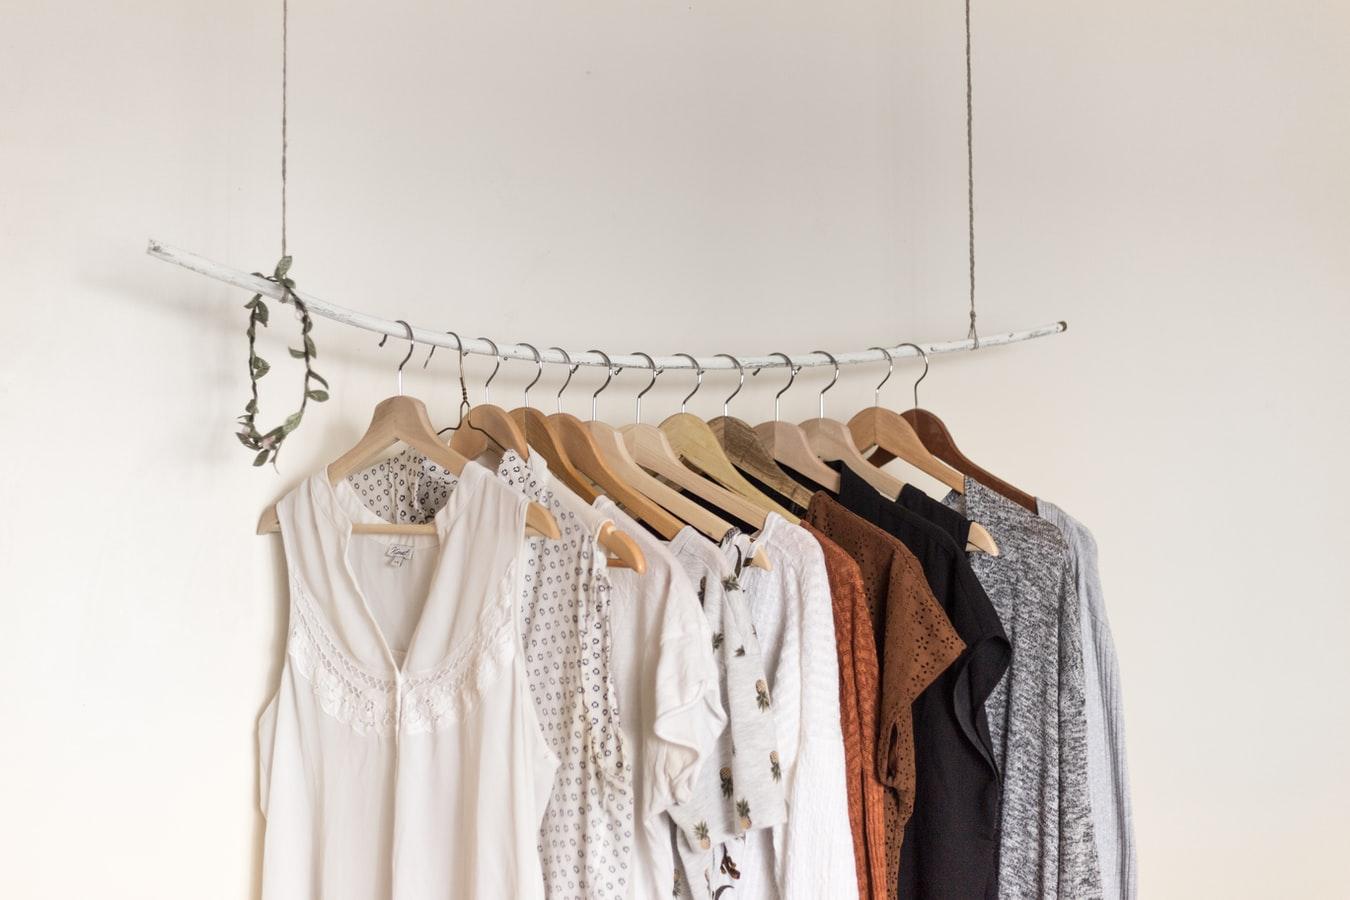 Ketahui 10 Arti Warna Baju Yang Kamu Kenakan